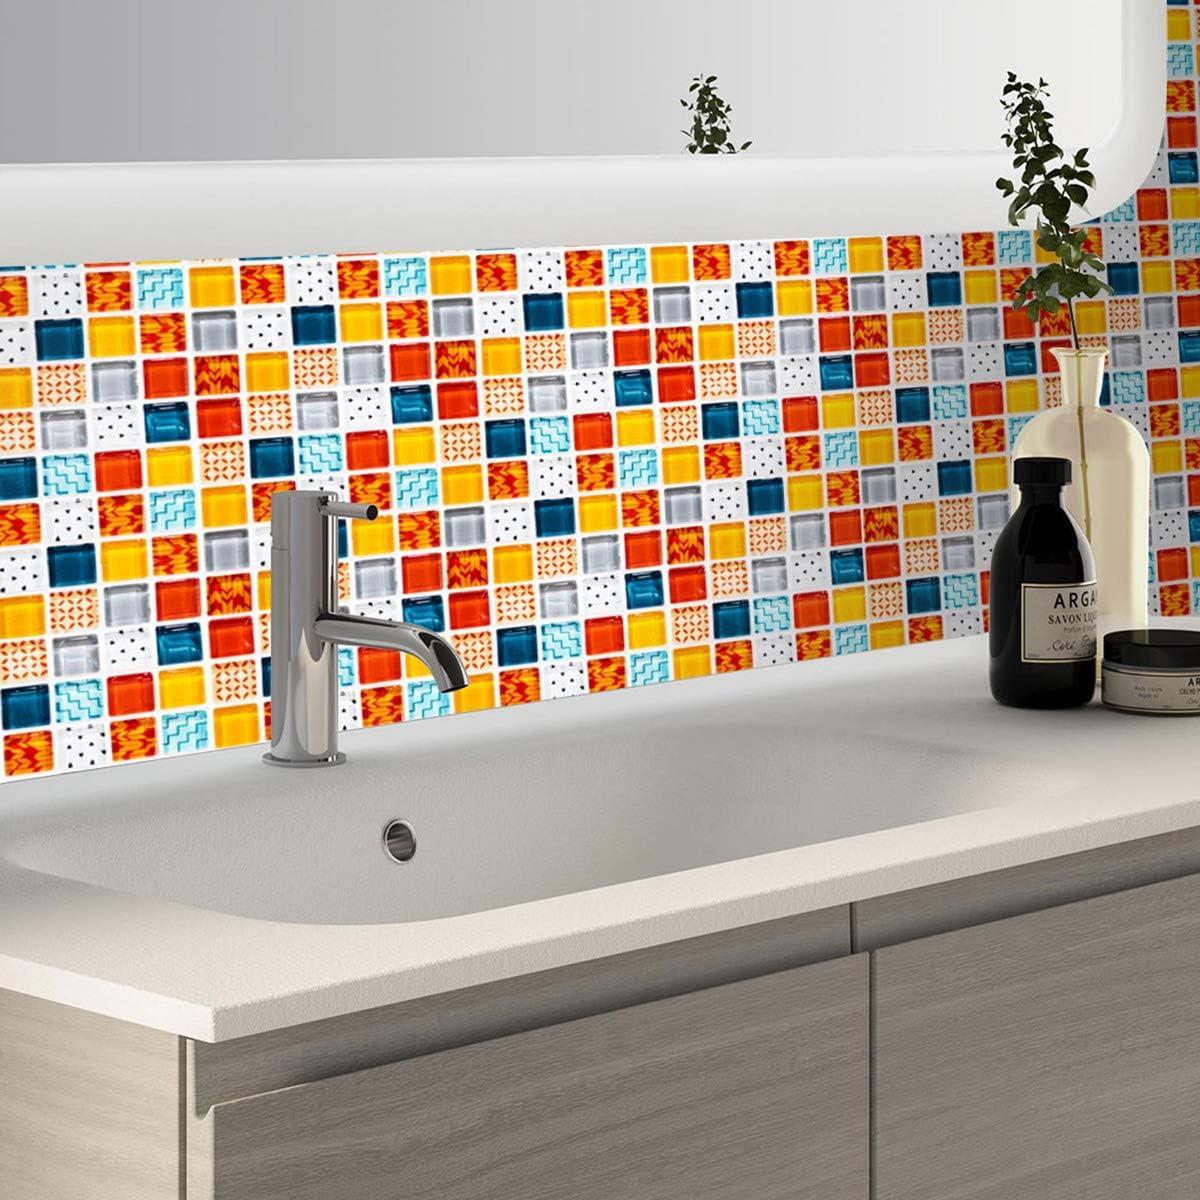 decalmile 10 St/ück Fliesenaufkleber 15x15cm Buntes Mosaik Wandfliese Fliesensticker K/üche Badezimmer Deko